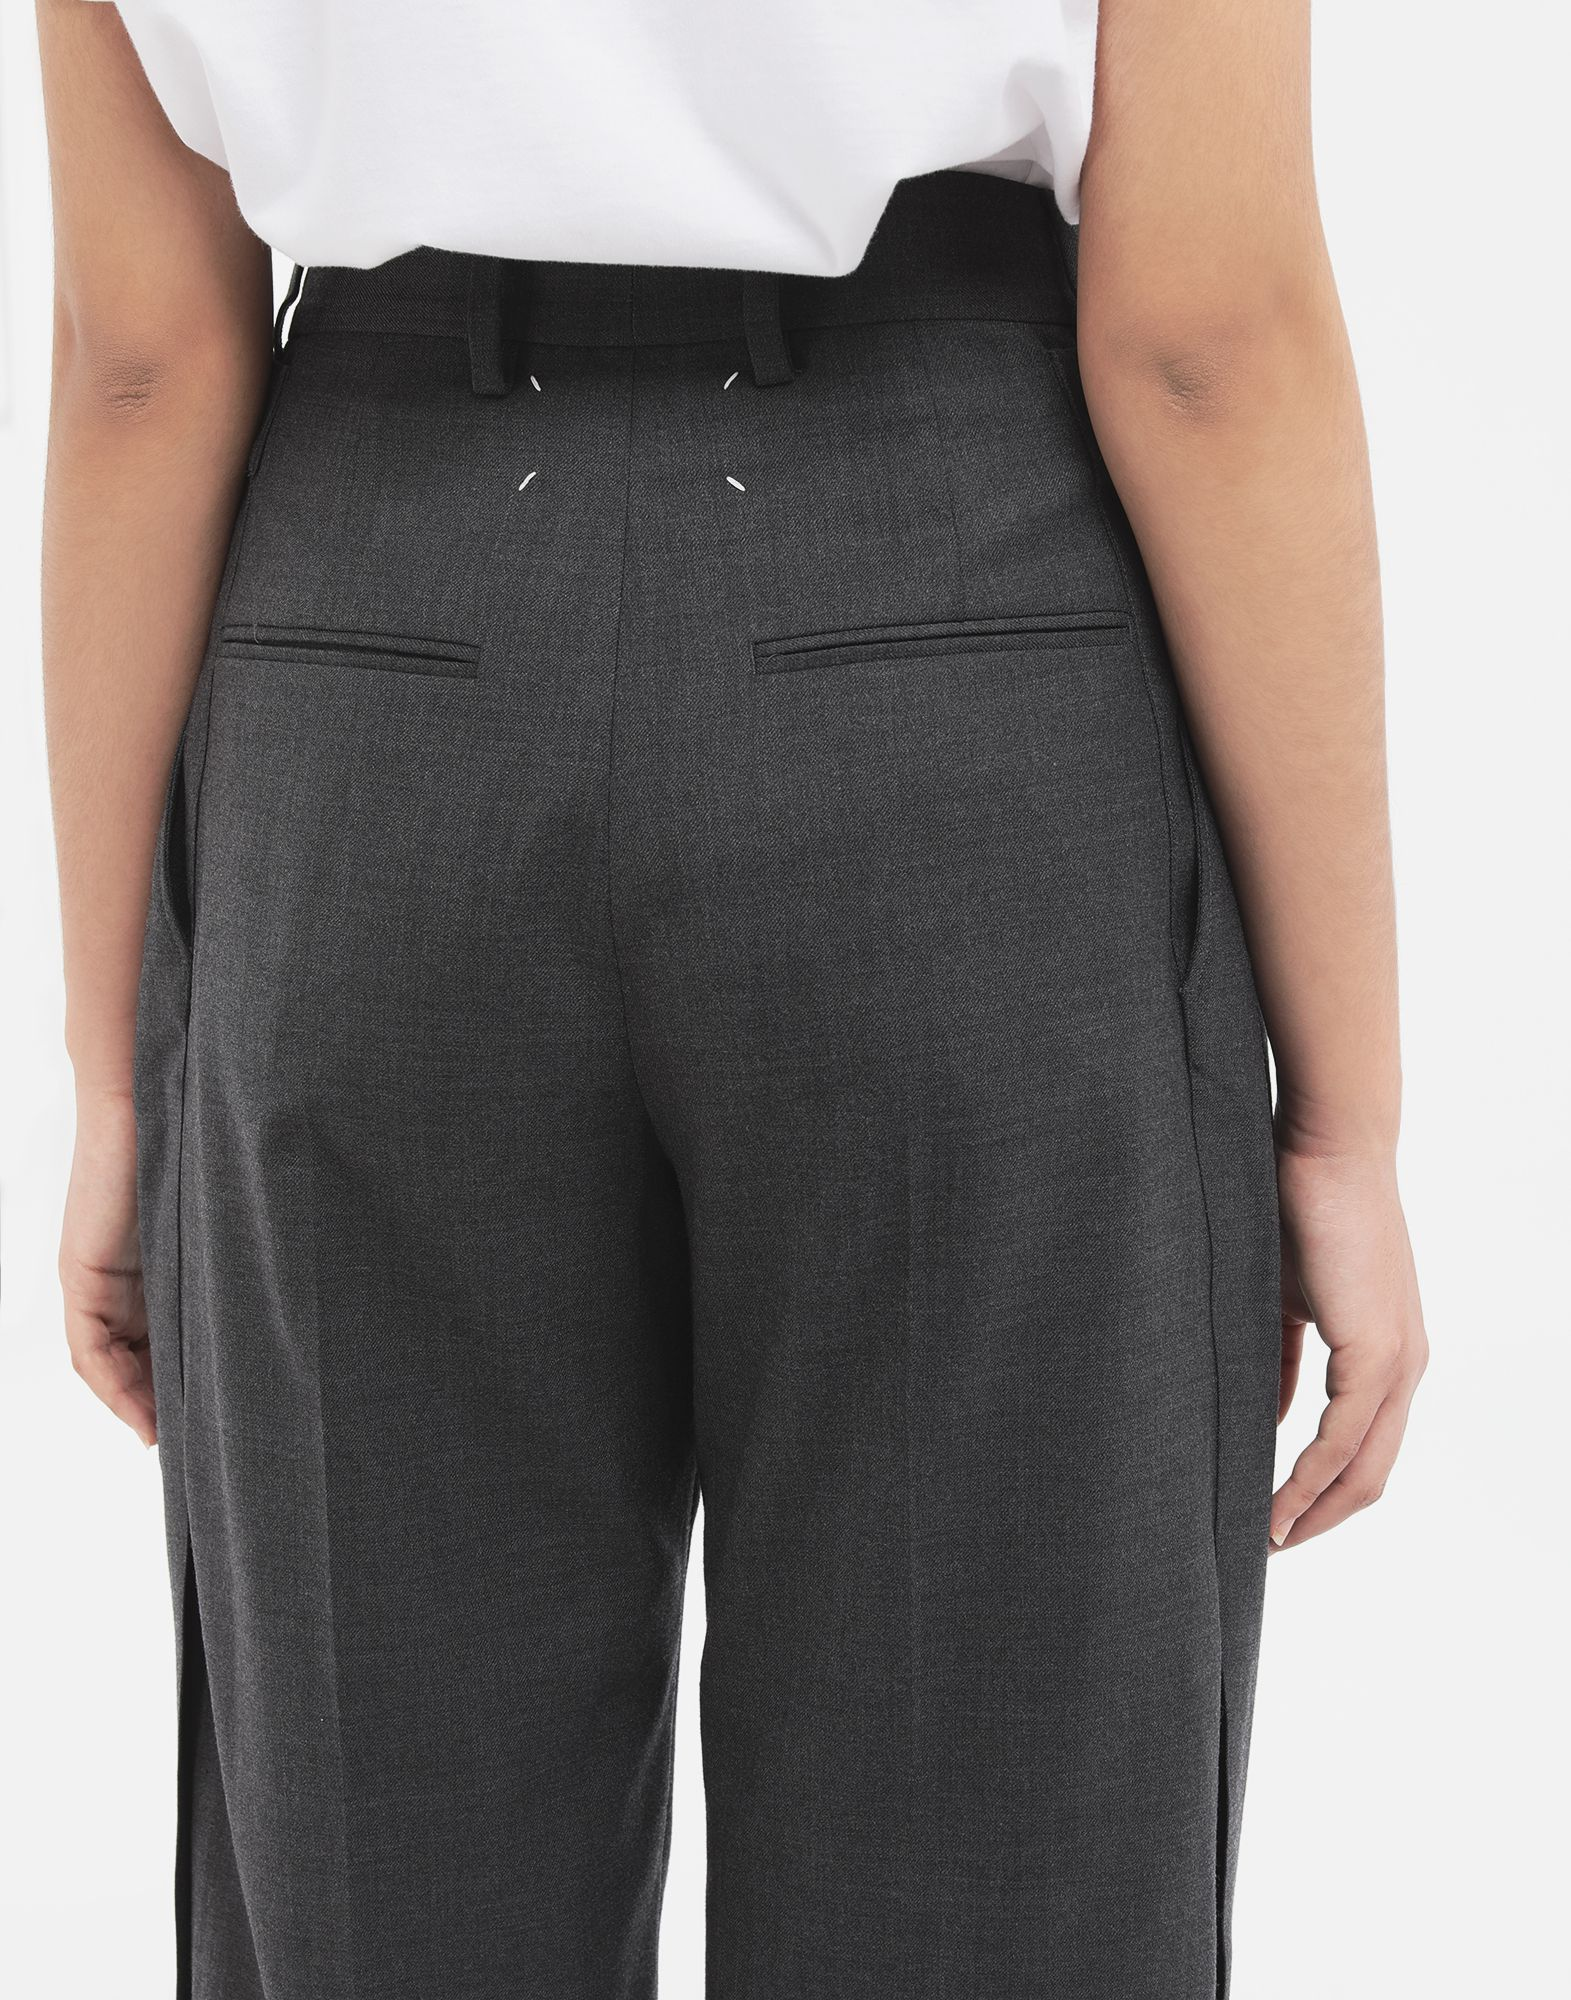 MAISON MARGIELA Spliced trousers Casual pants Woman b